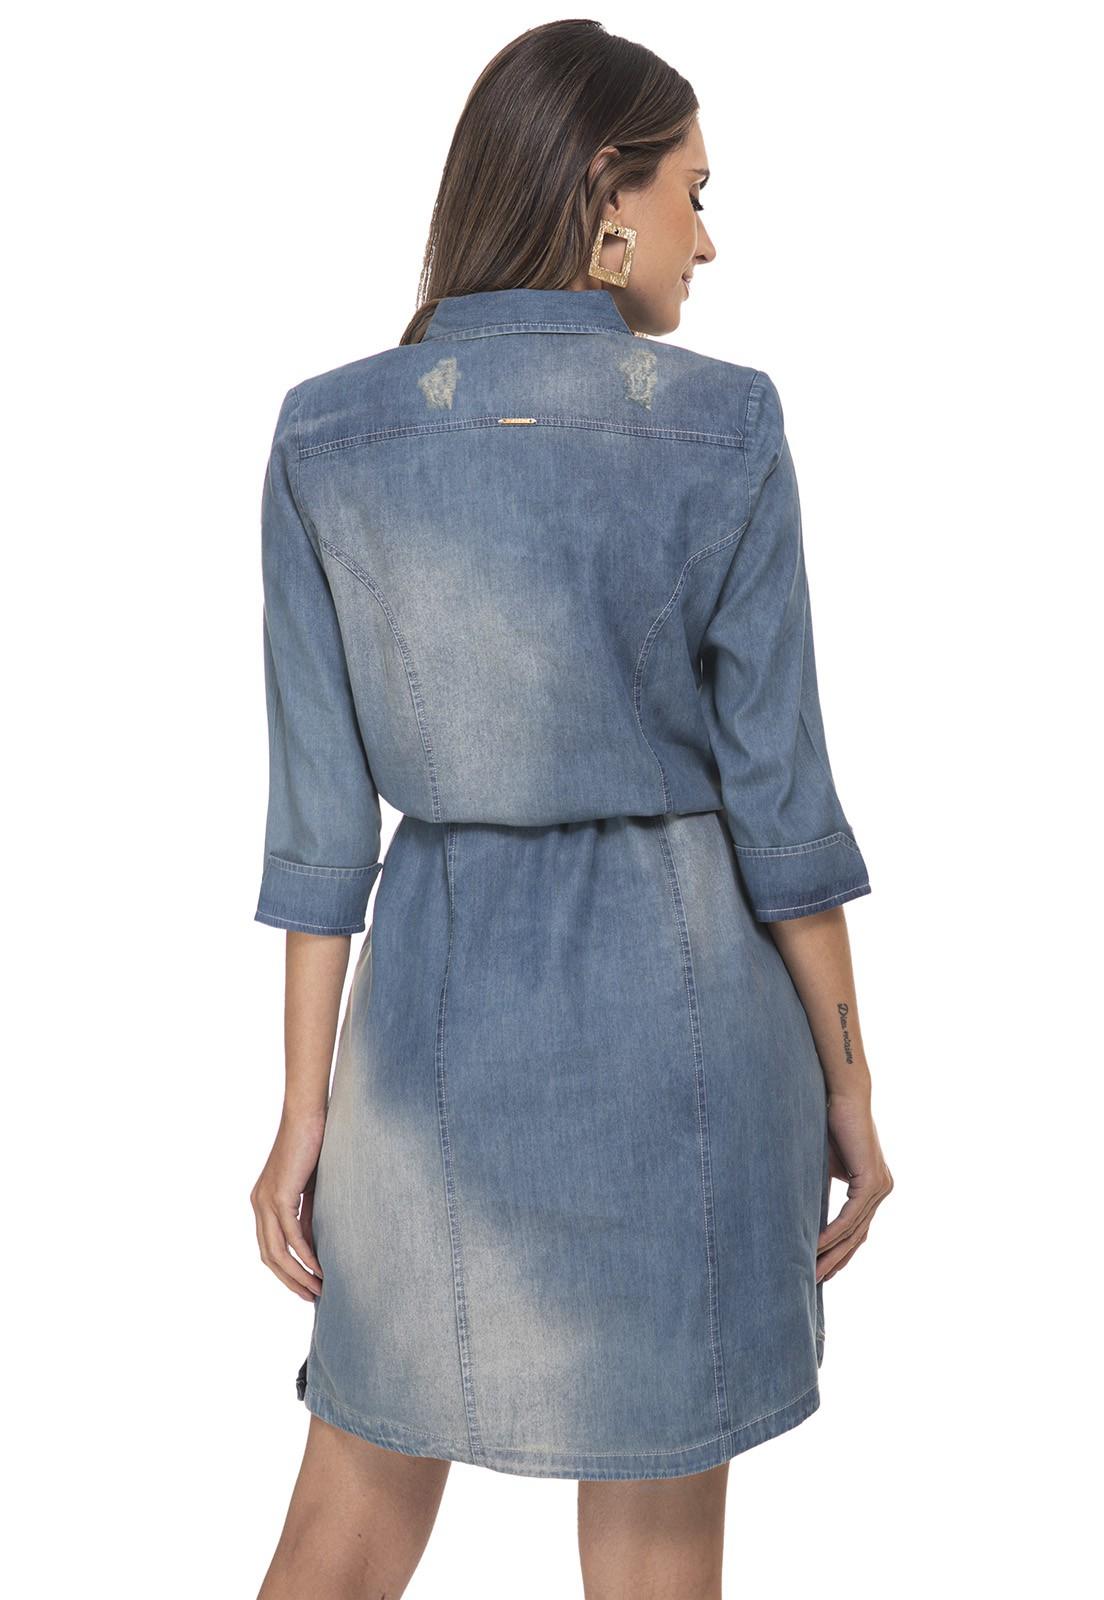 Vestido Jeans Chemise Zaiko Destroyed 3/4 1844